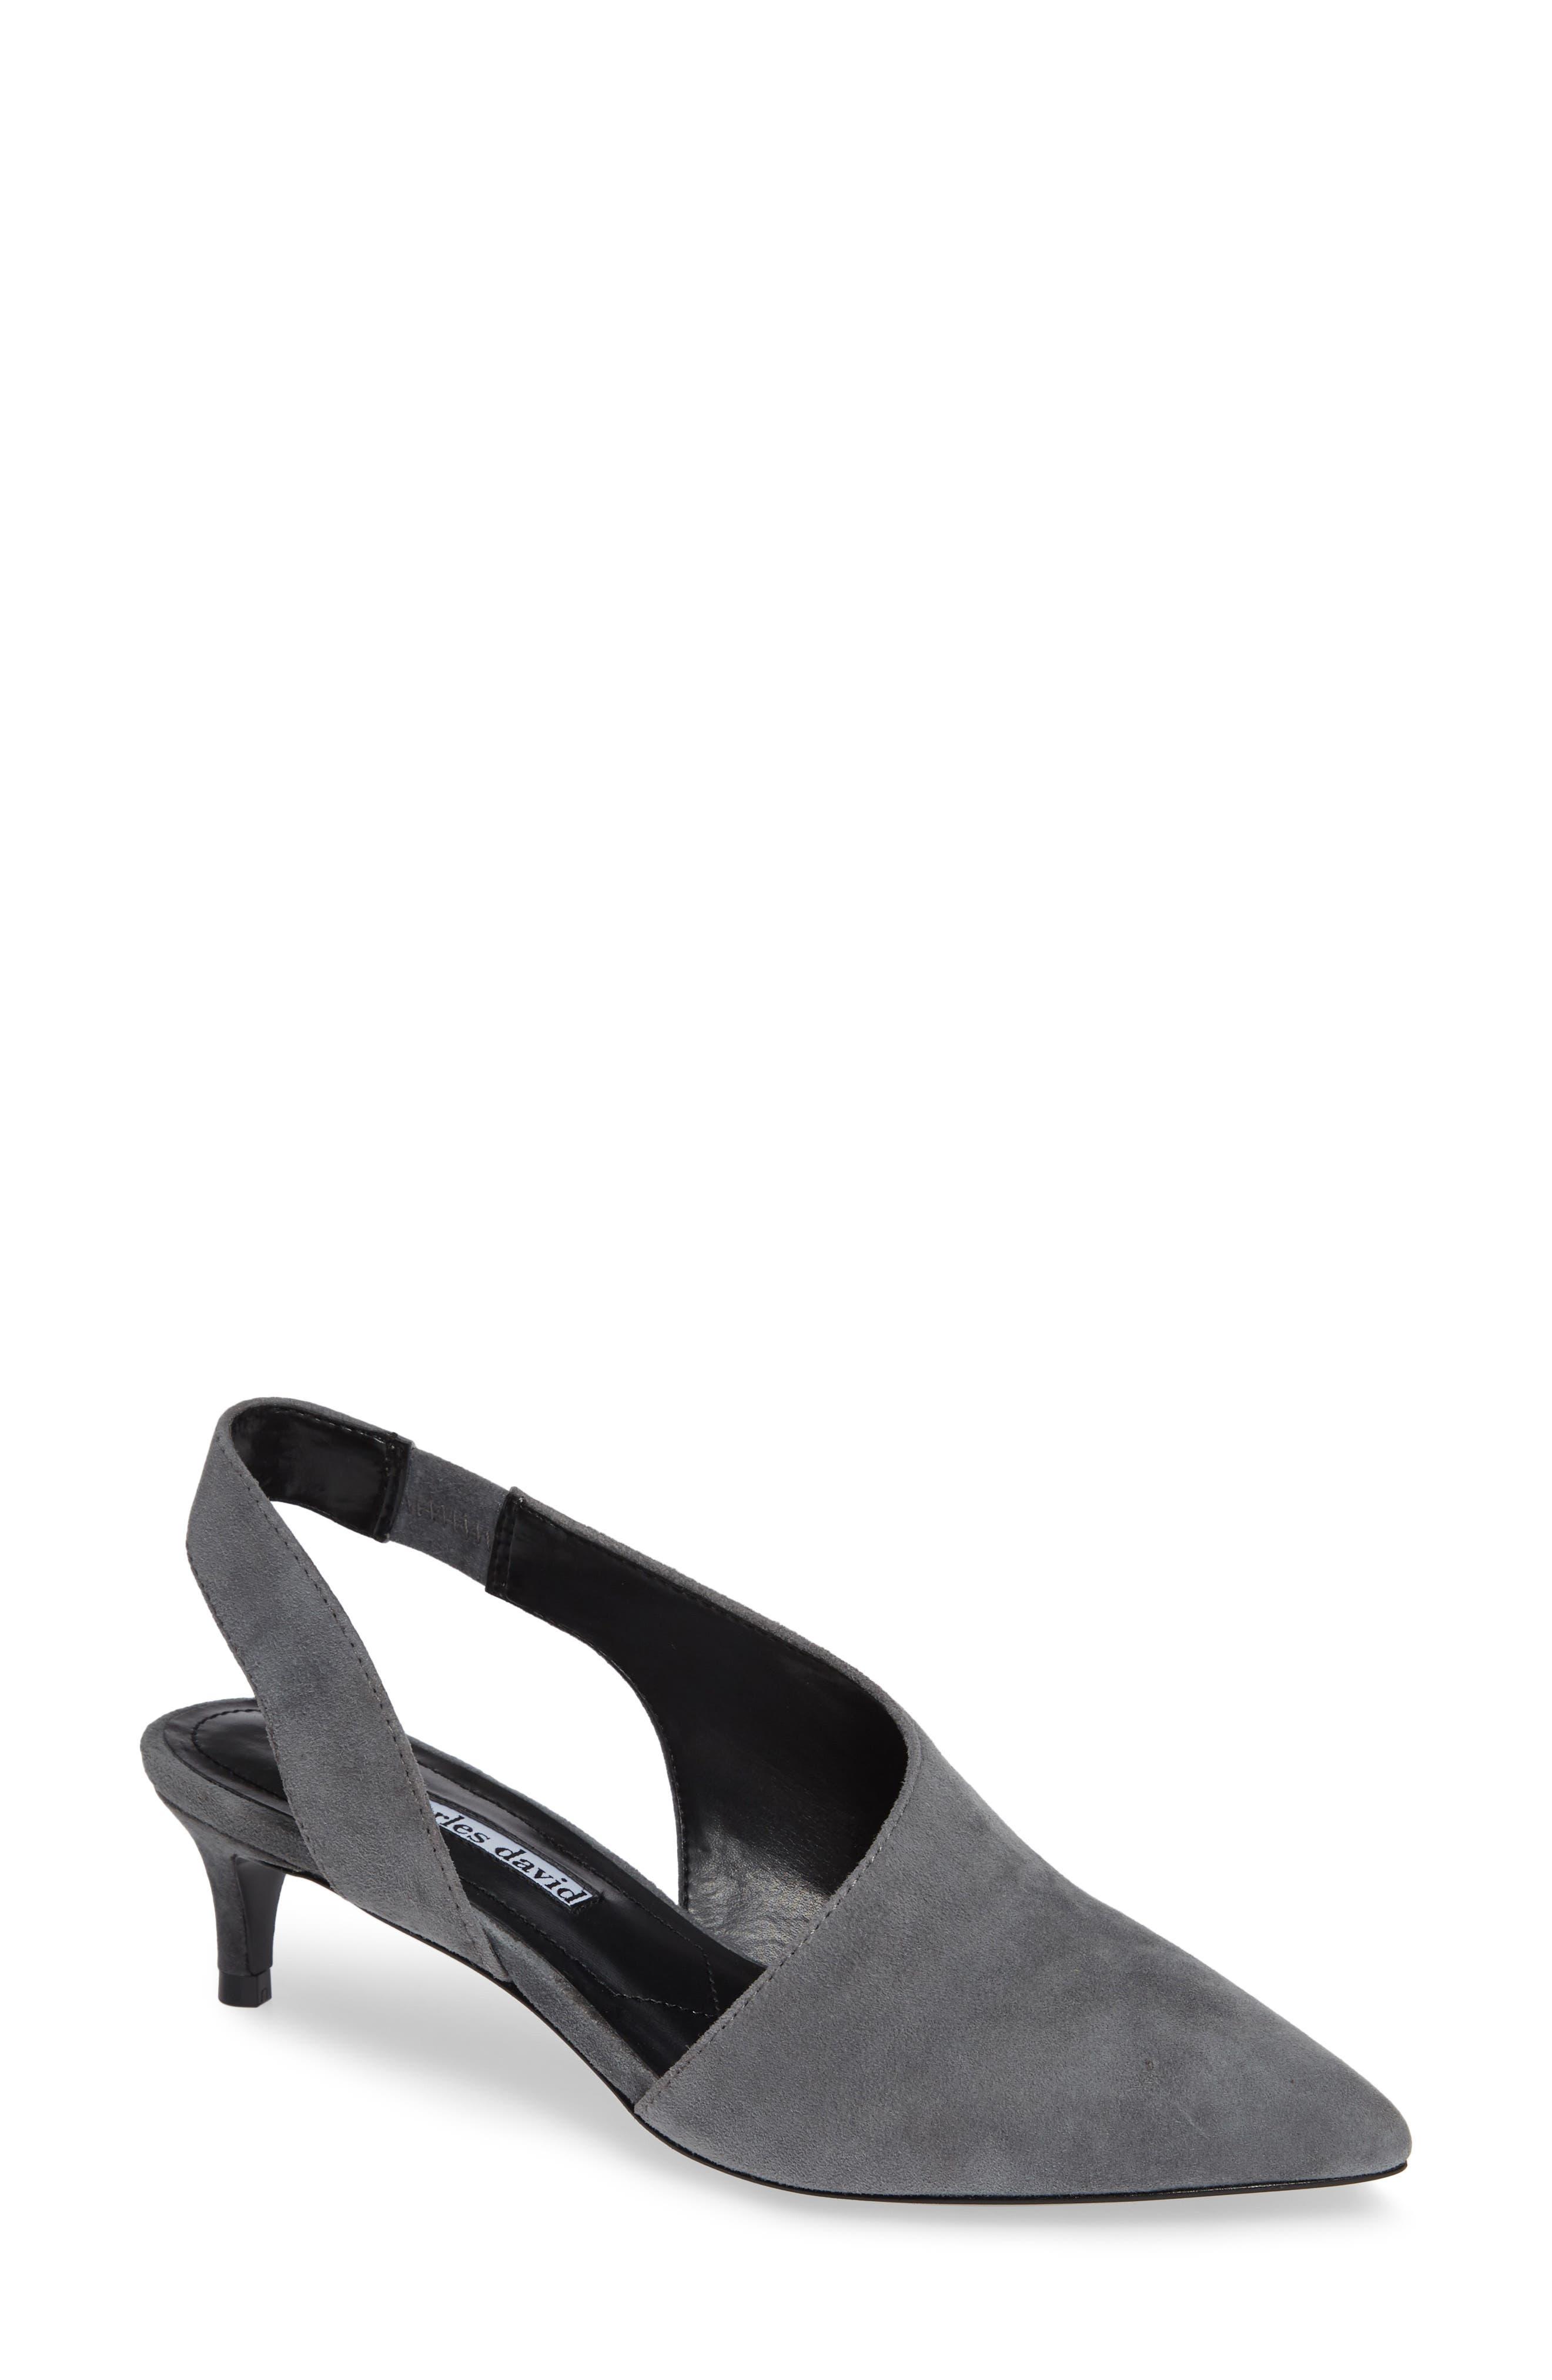 Charles David Picasso Asymmetrical Slingback Pump, Grey